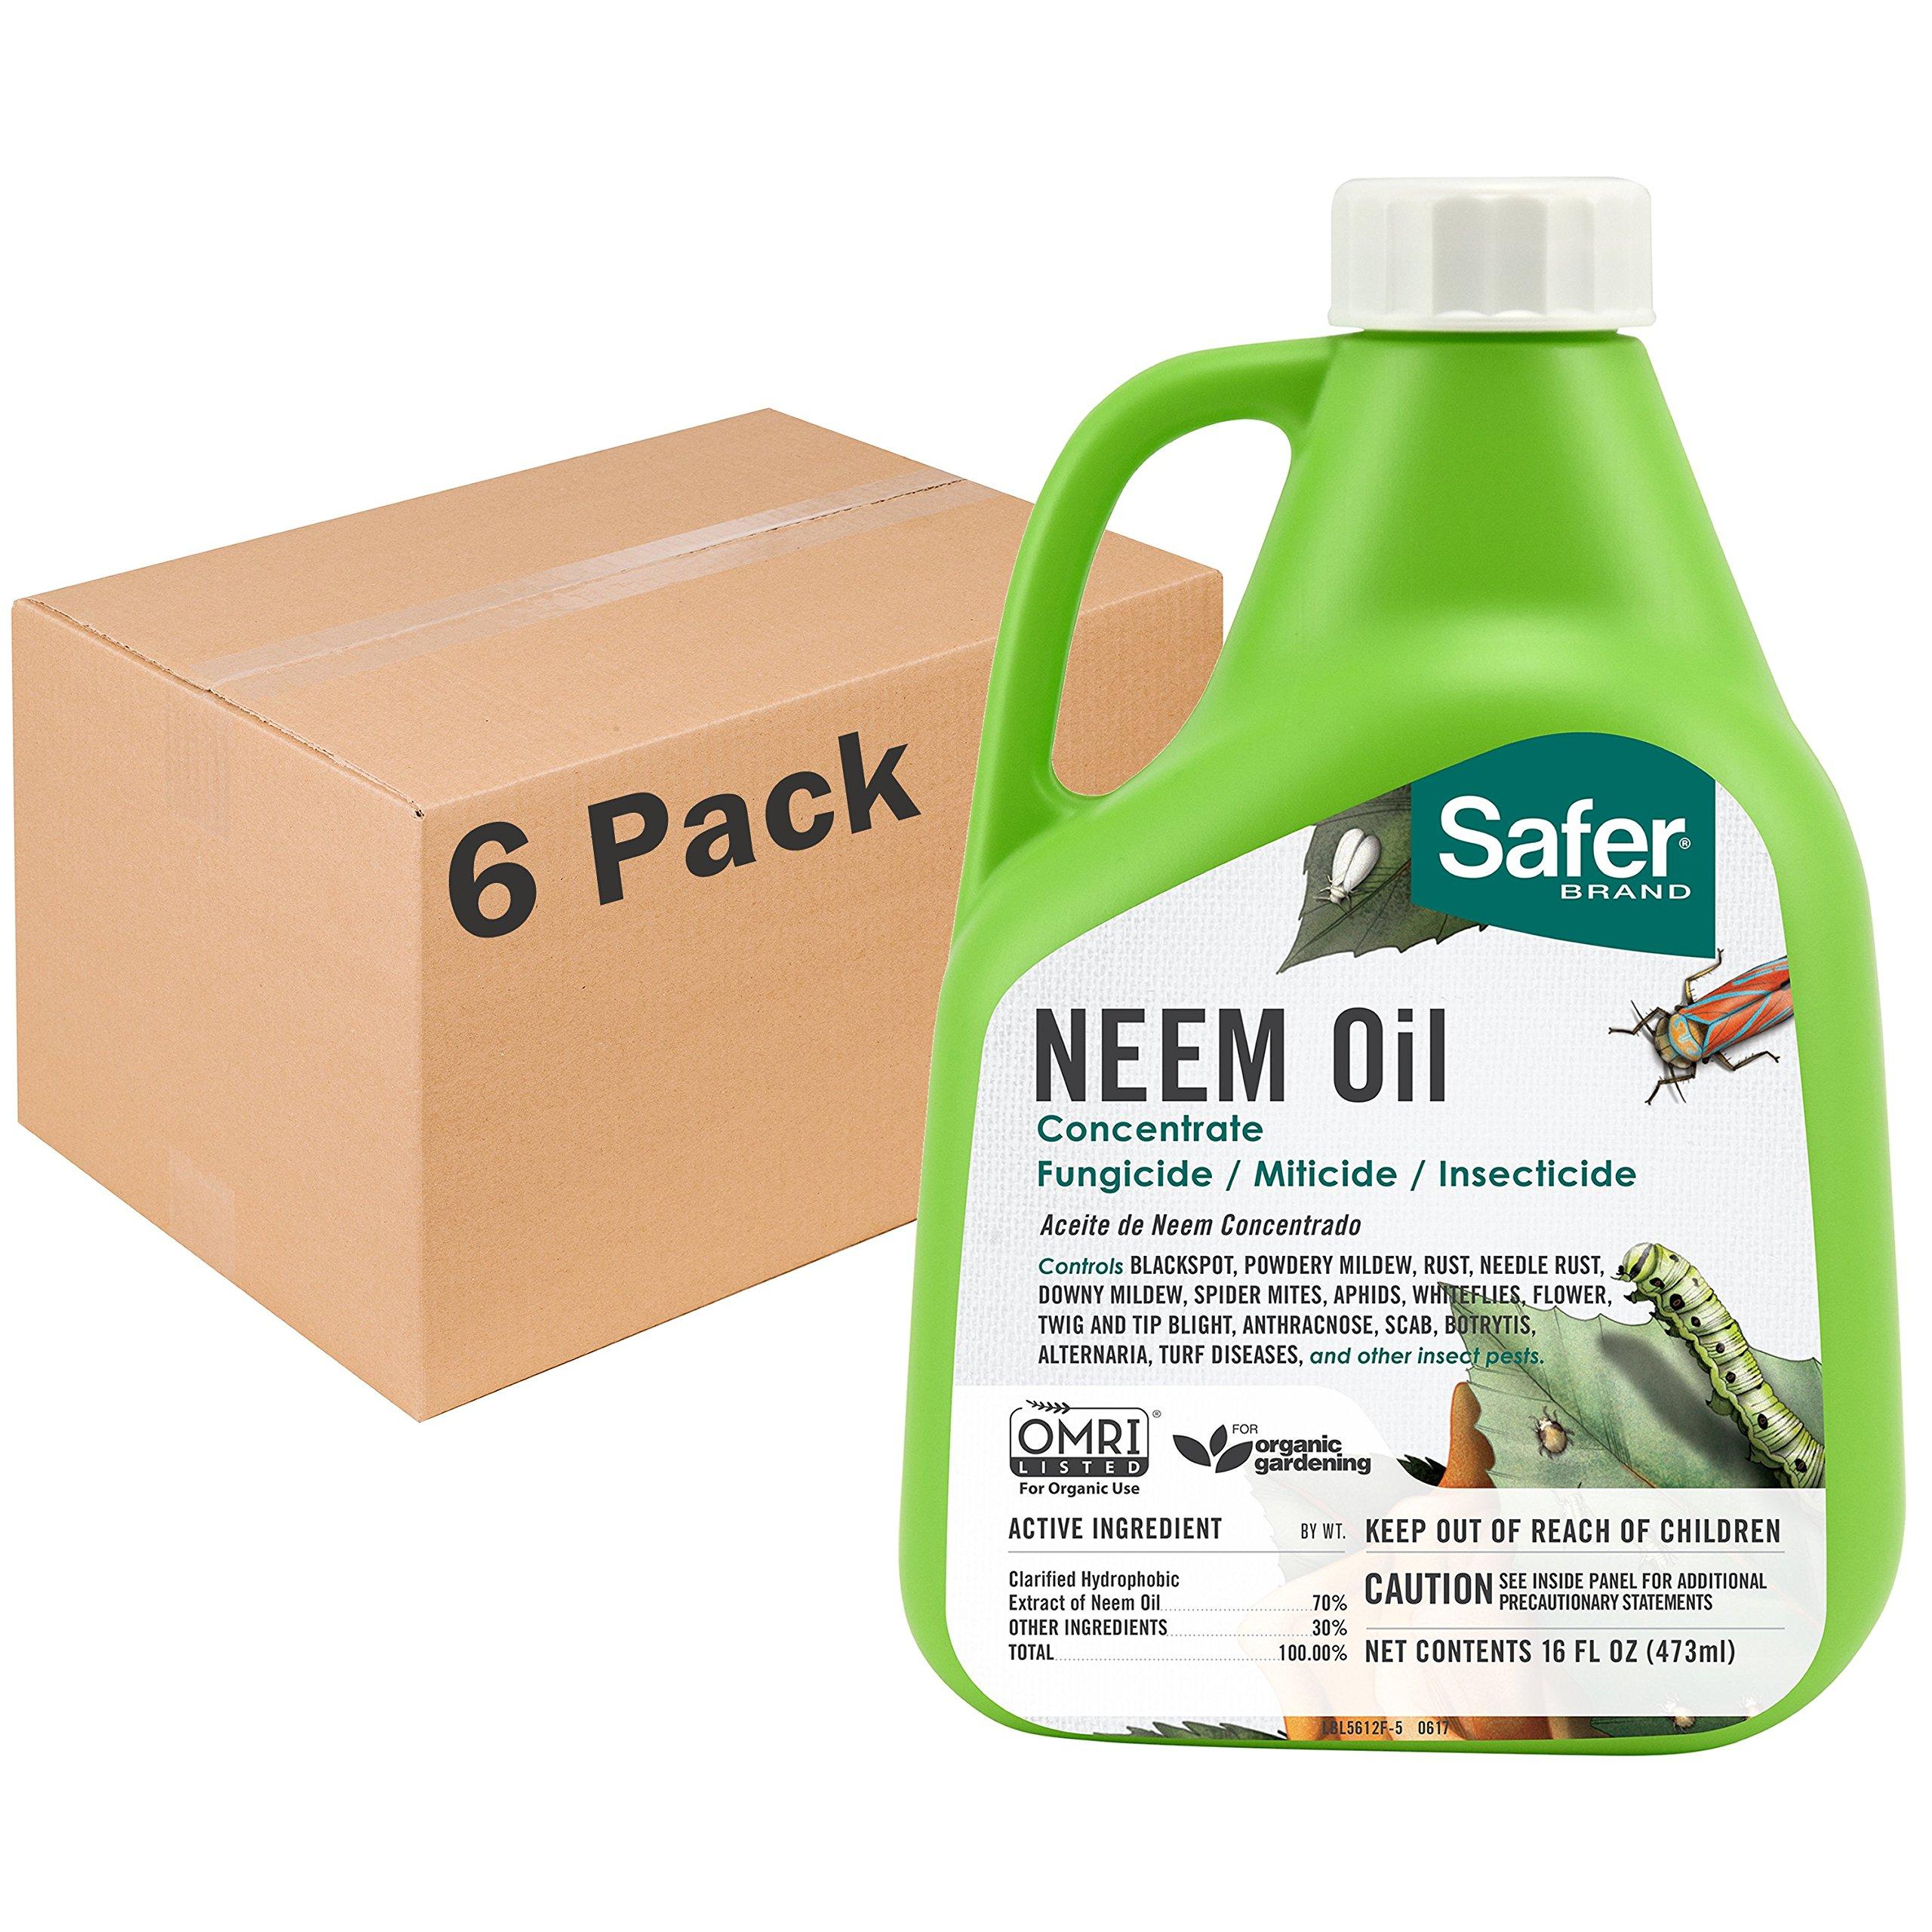 Safer Brand Neem Oil Concentrate 16oz